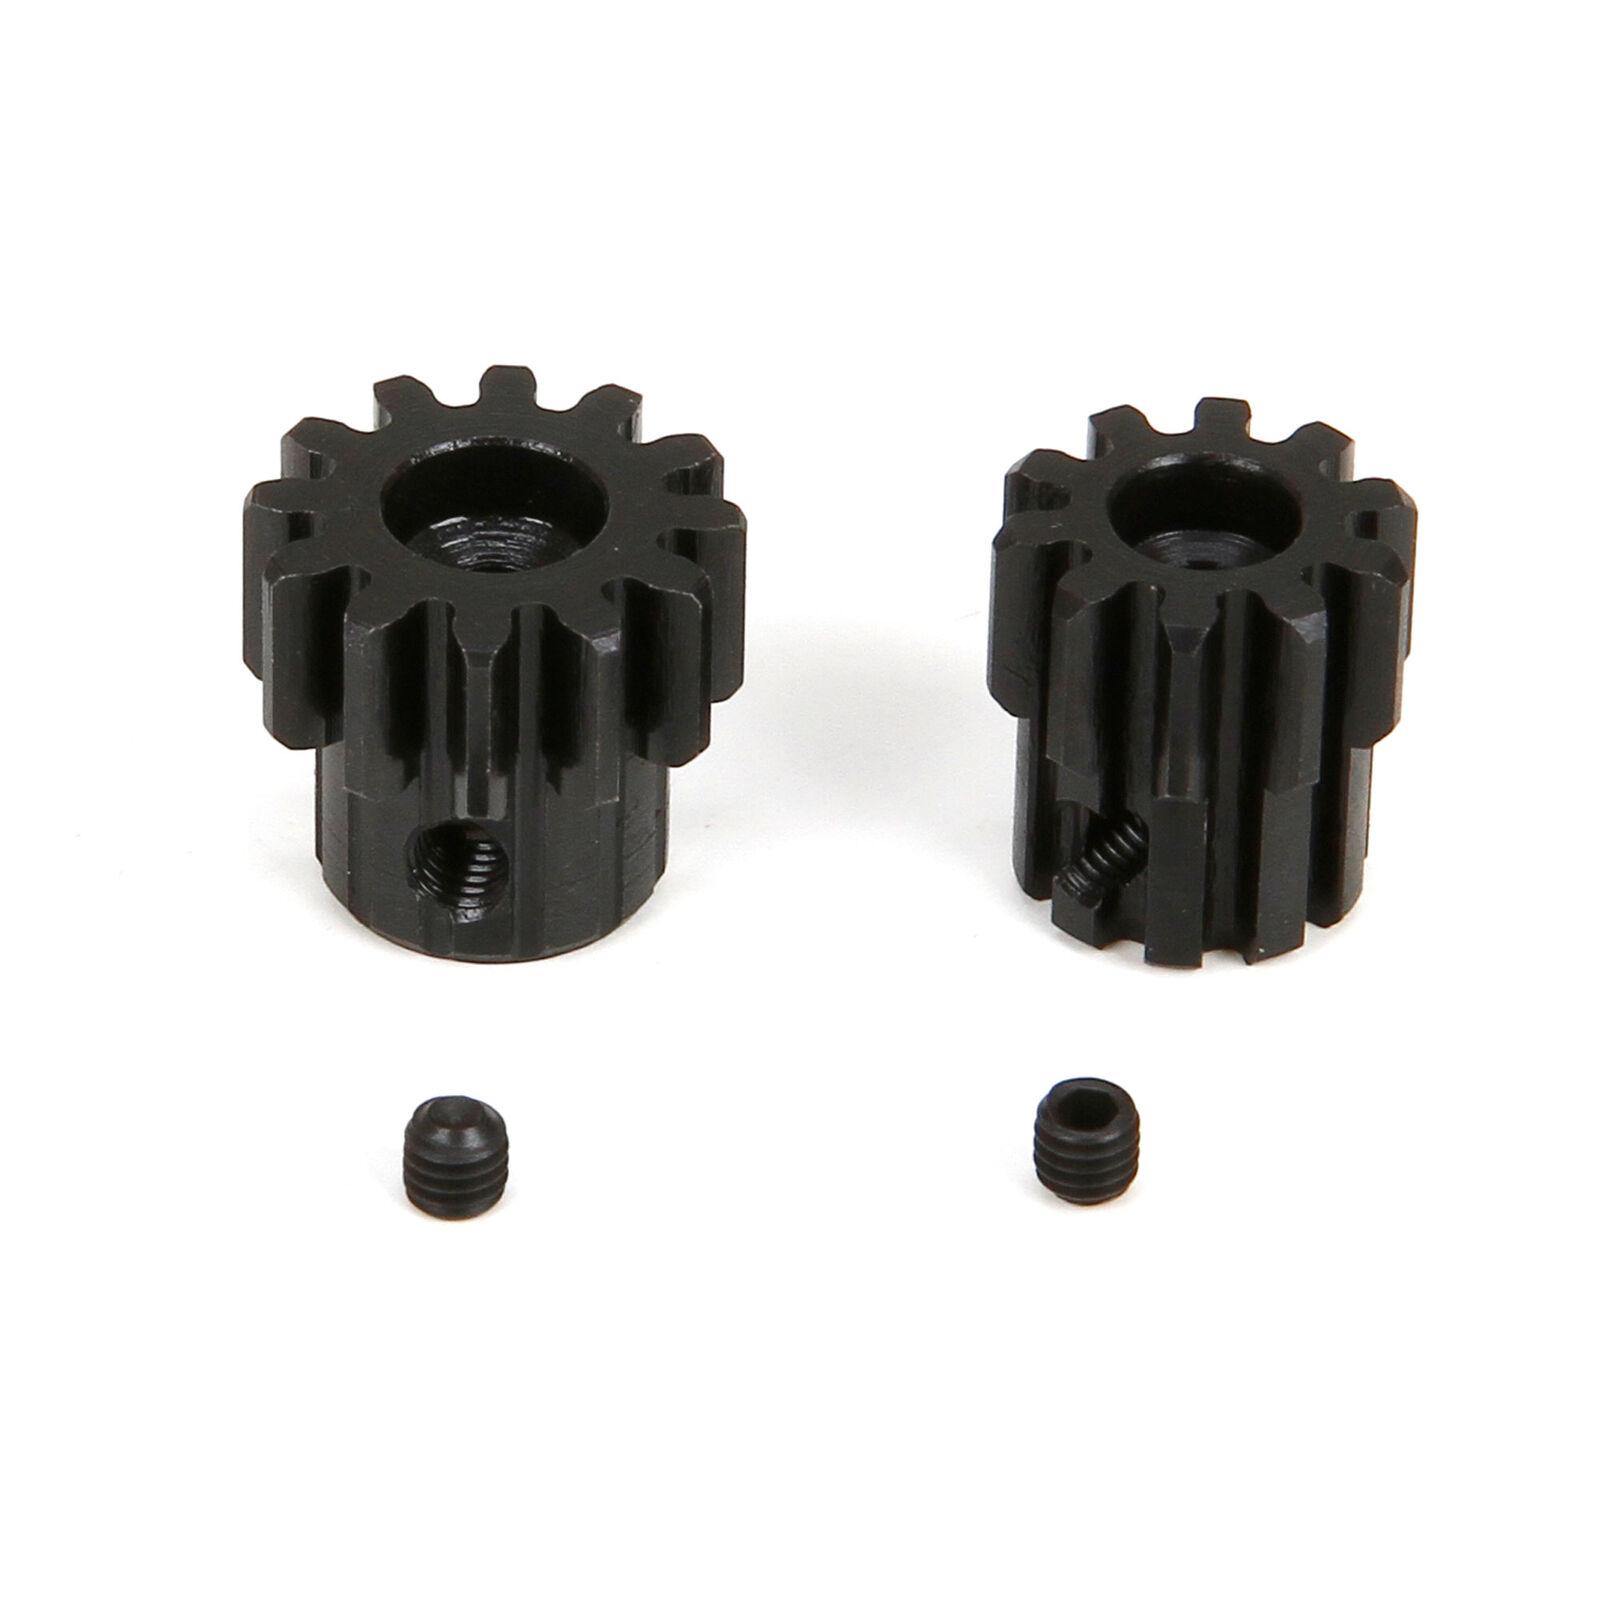 ECX Ritzel 9 Zähne/ 12 Zähne x 3 mm Mod 1